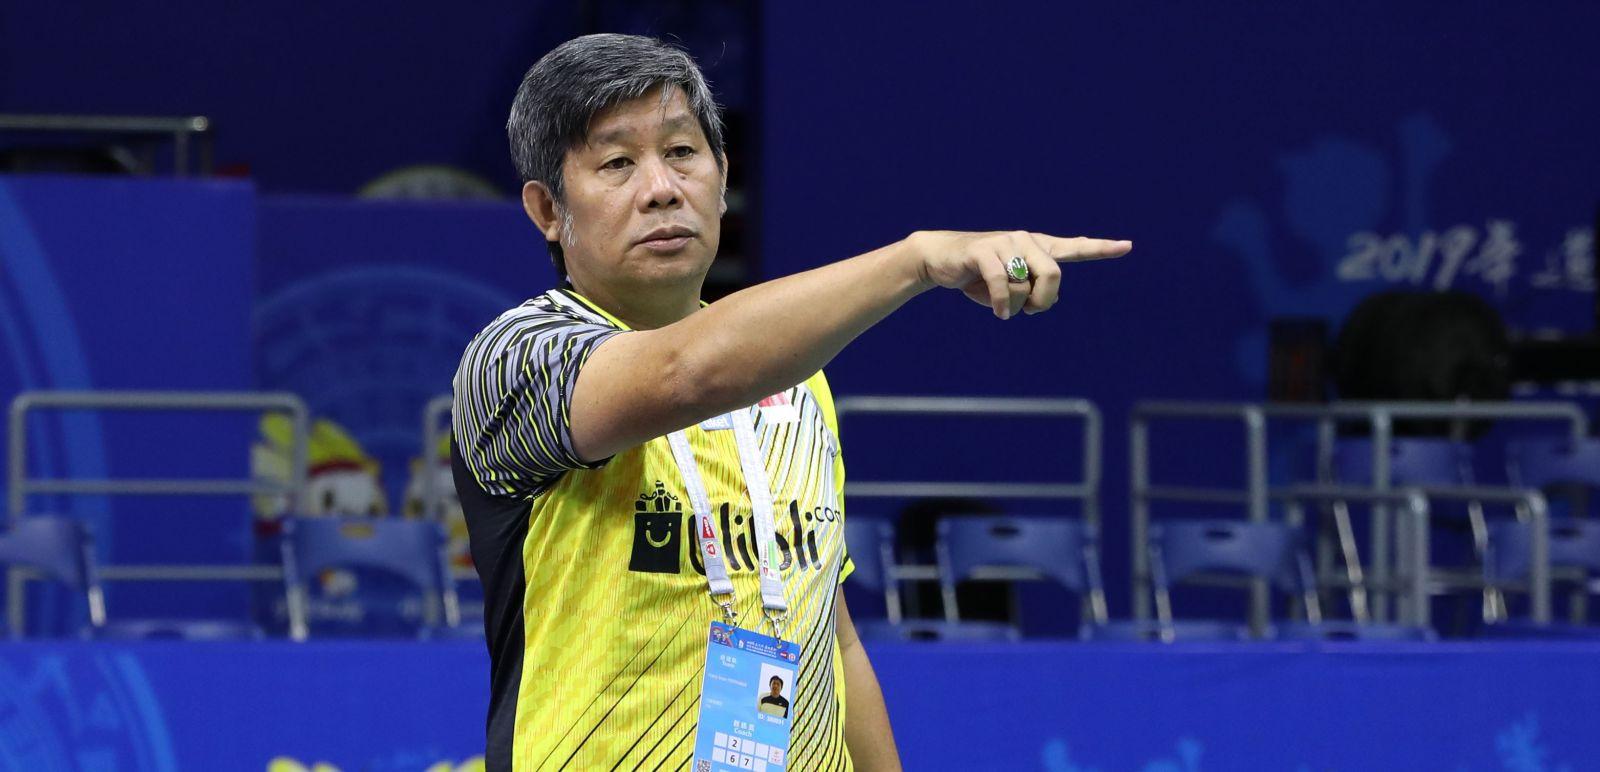 Herry Ip, pelatih ganda putra Indonesia. (foto: Badminton Indonesia via JPNN)